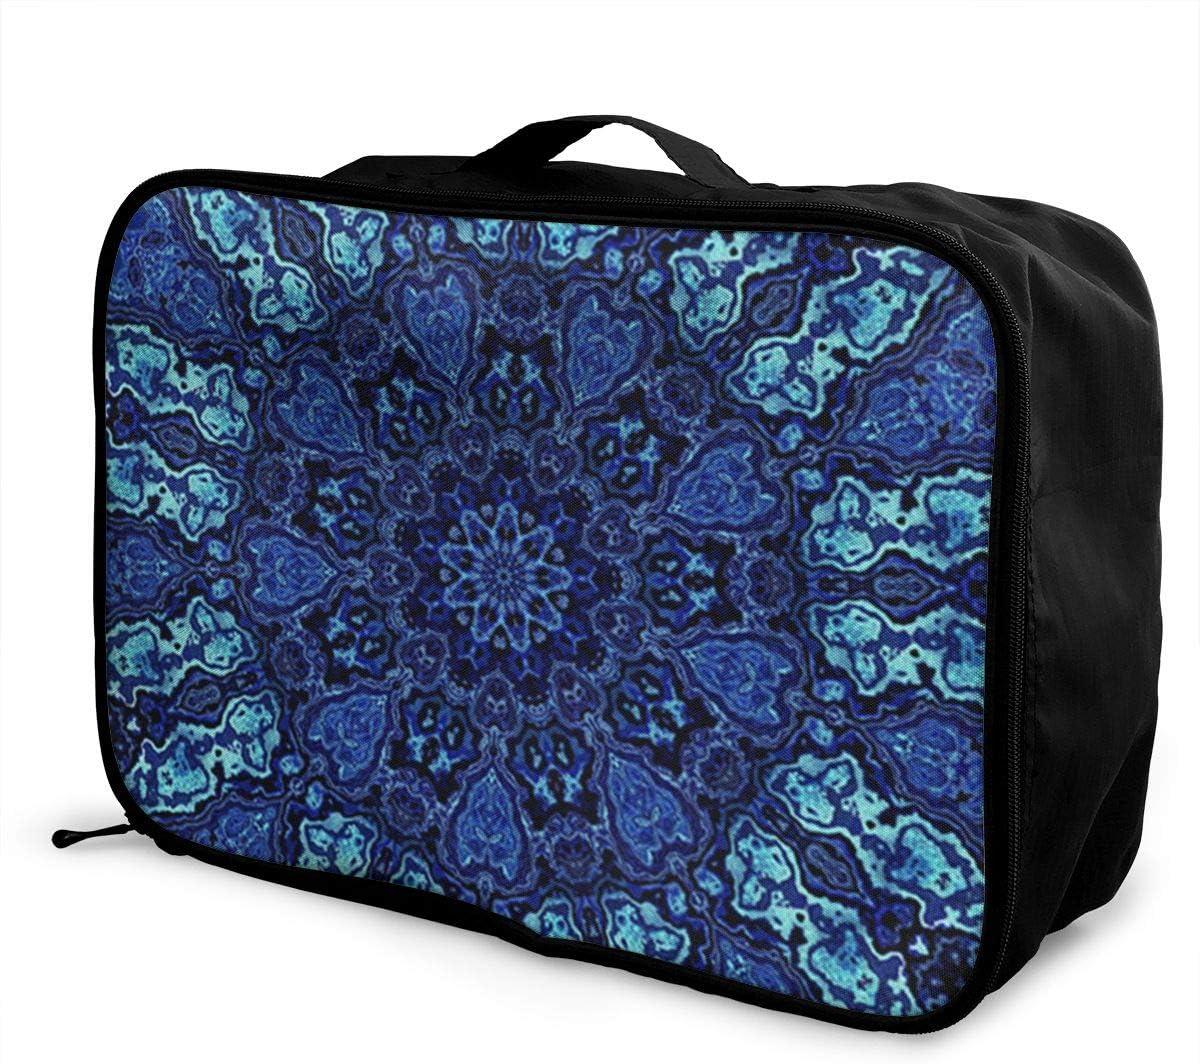 Blue-mandala Travel Carry-on Luggage Weekender Bag Overnight Tote Flight Duffel In Trolley Handle